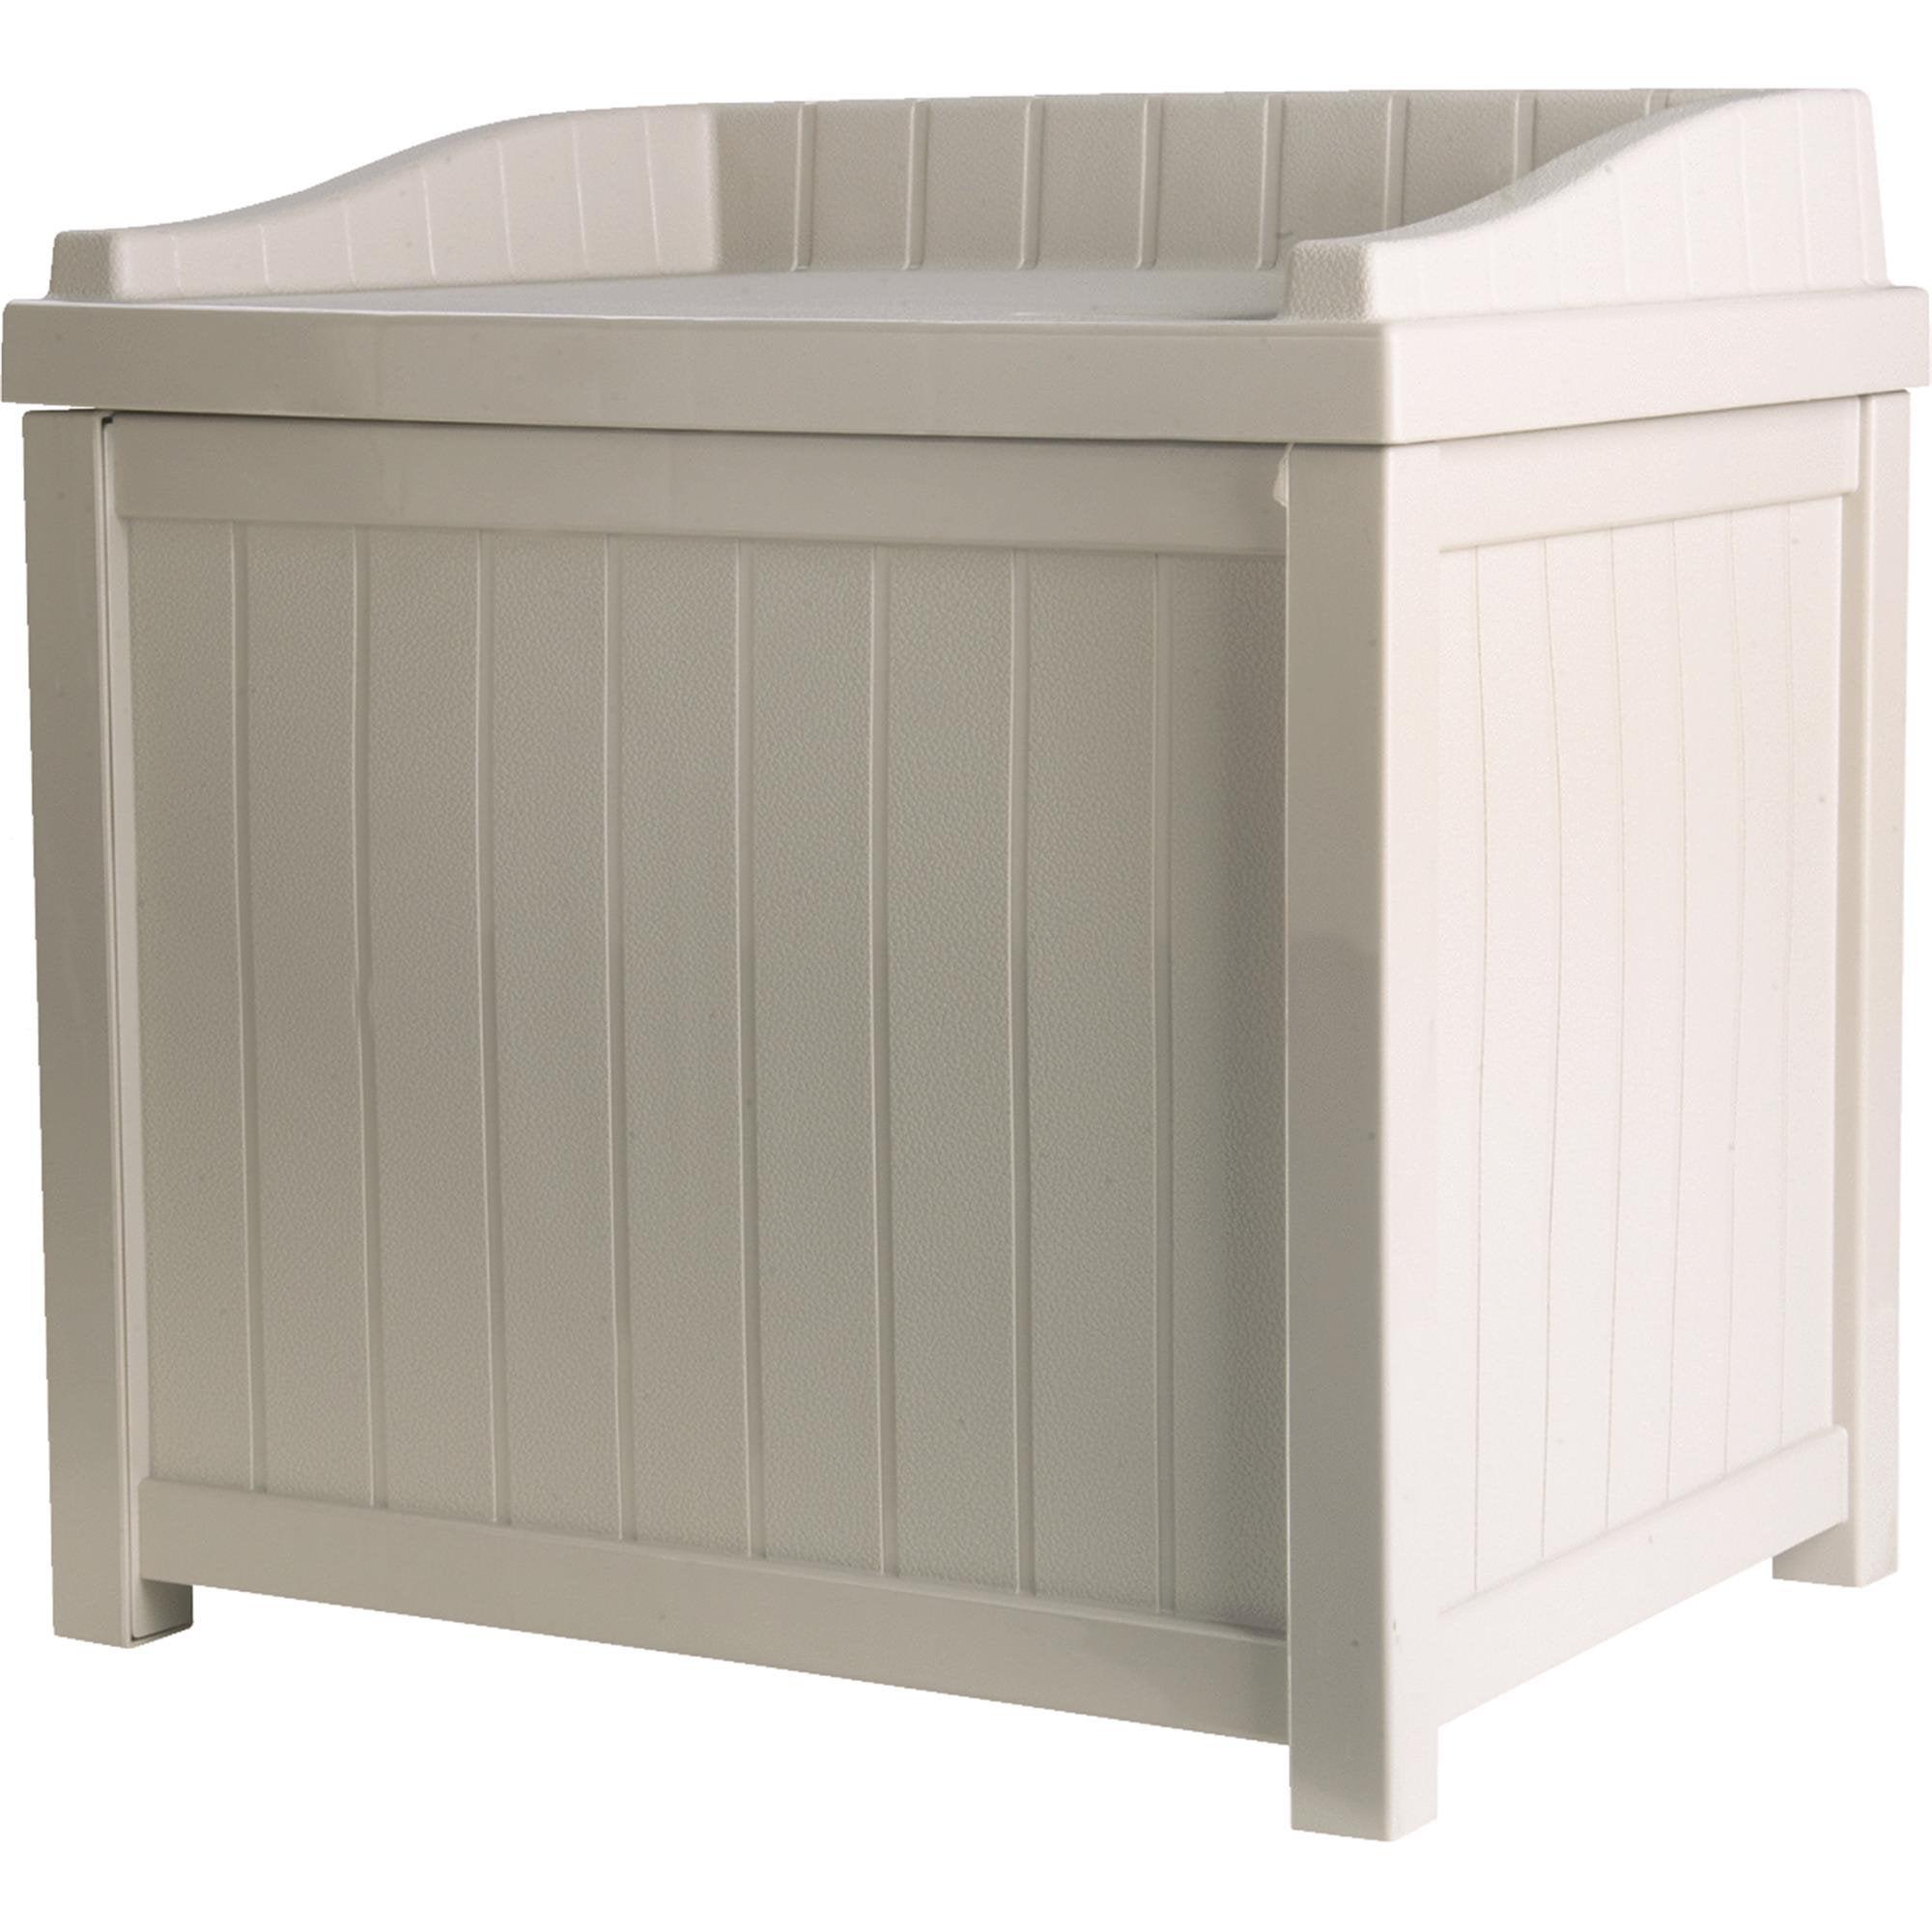 Suncast Resin Wicker Storage Bench